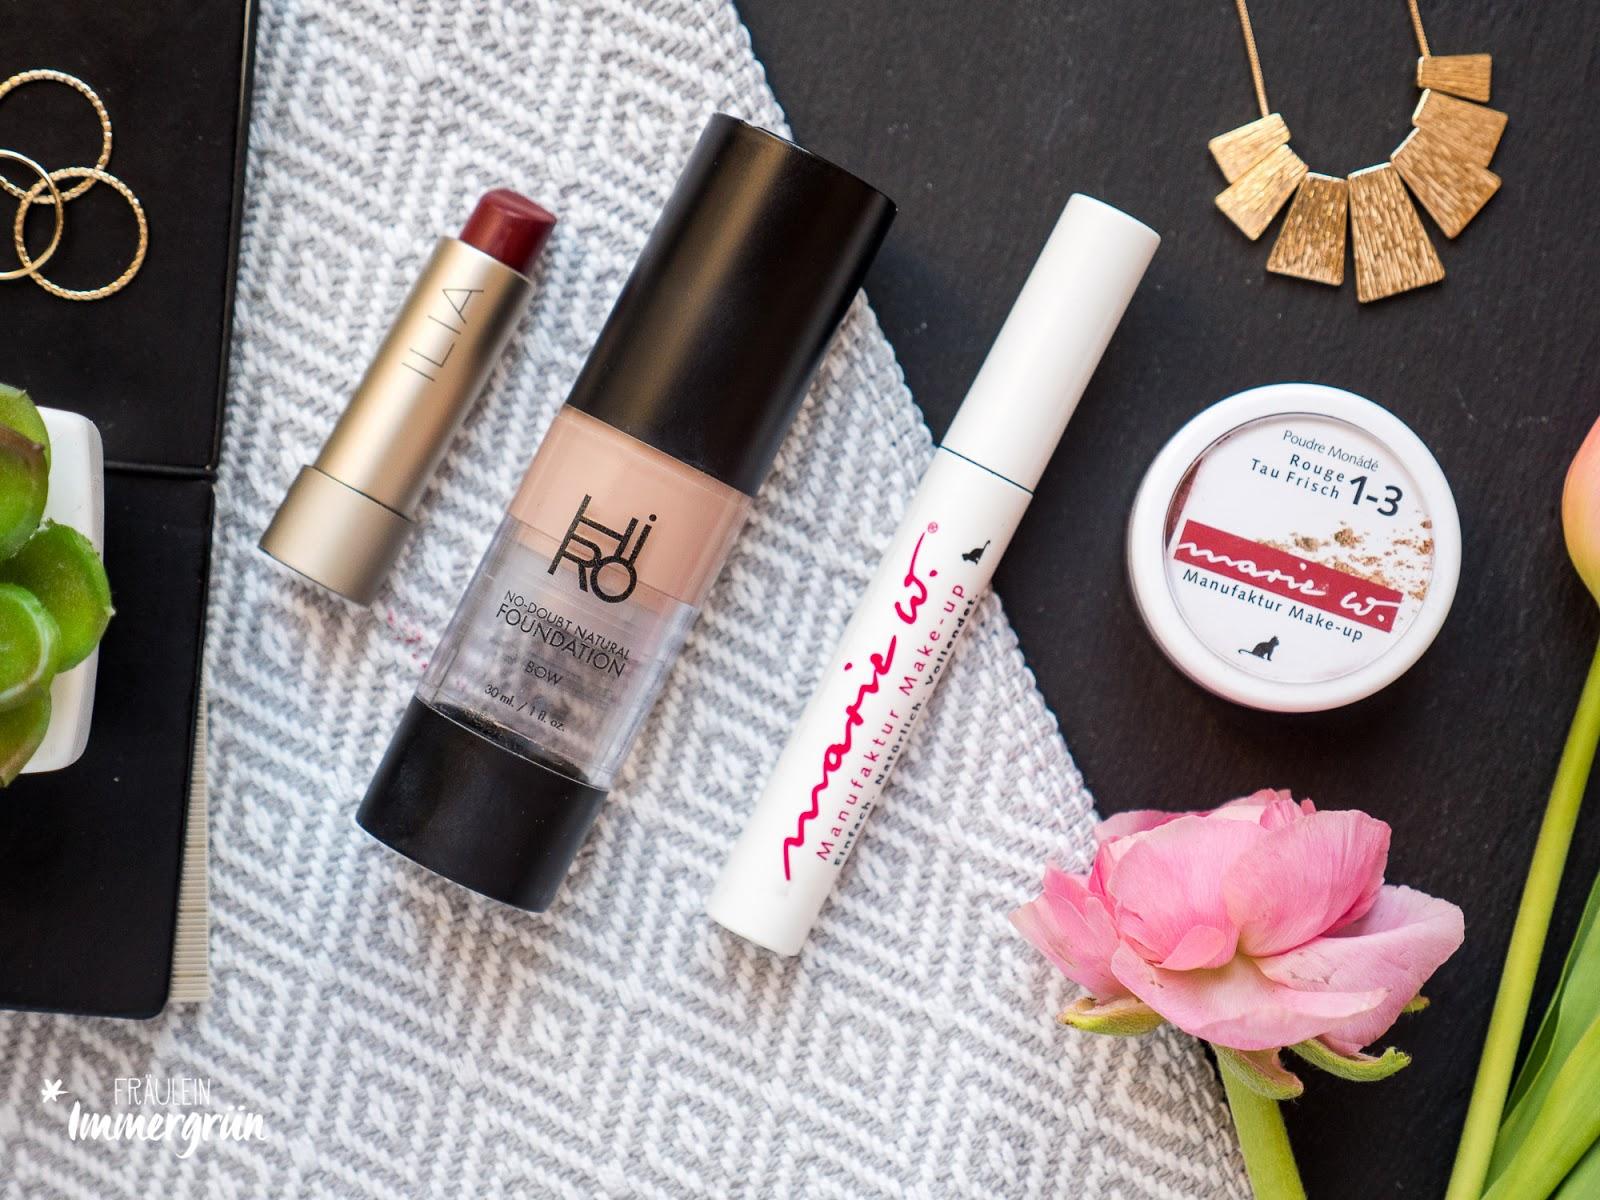 Hiro Cosmetics No Doubt Foundation, Ilia Lipstick Lucys Party, Marie W. Mascara Rabenschwarz, marie W. Mineral Rouge Taufrisch